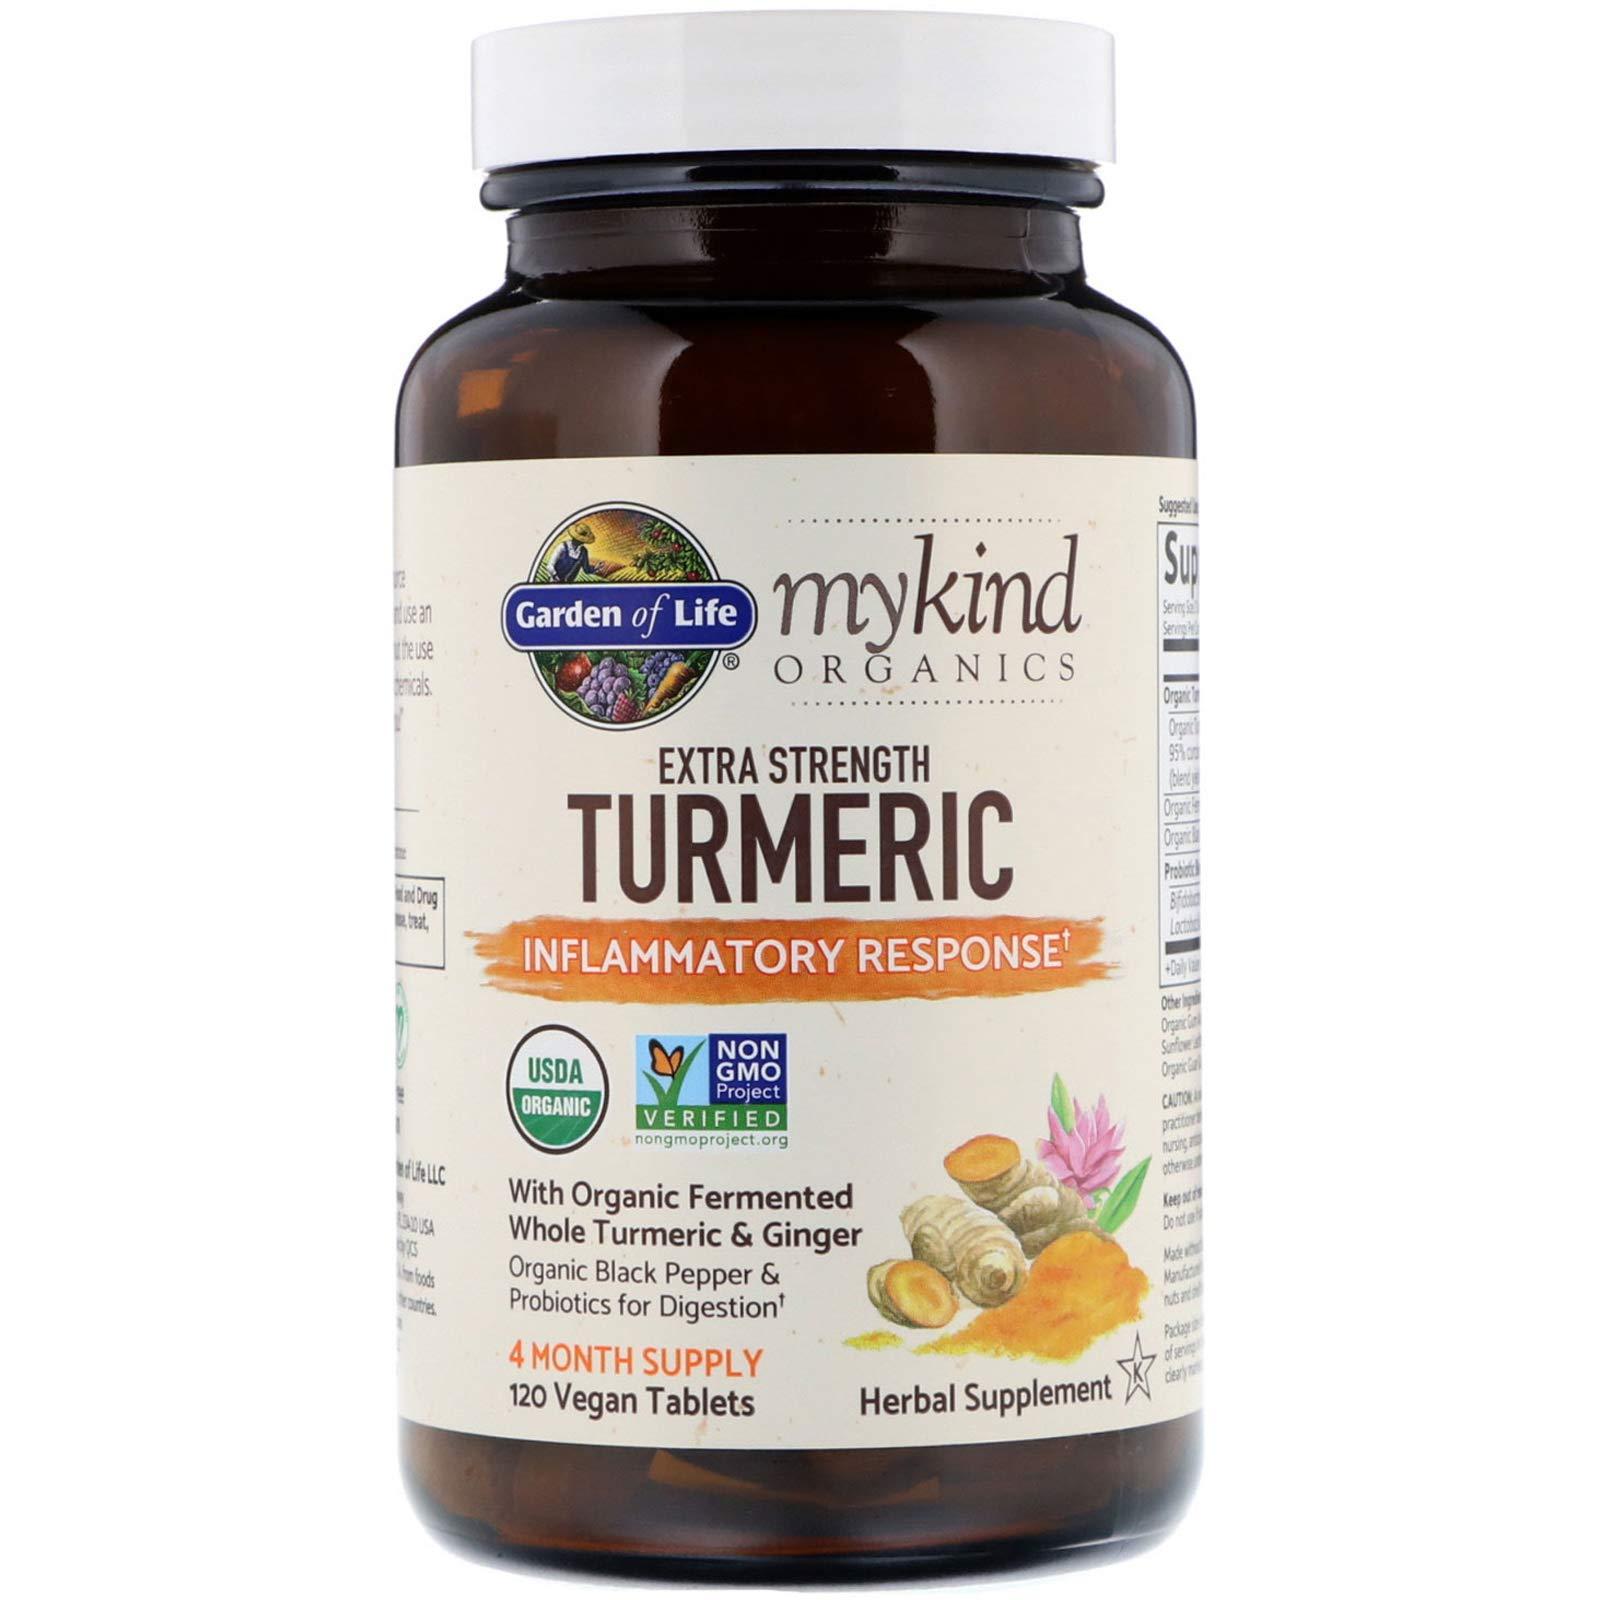 Garden of Life, MyKind Organics, Extra Strength Turmeric, Inflammatory Response, 120 Vegan Tablets